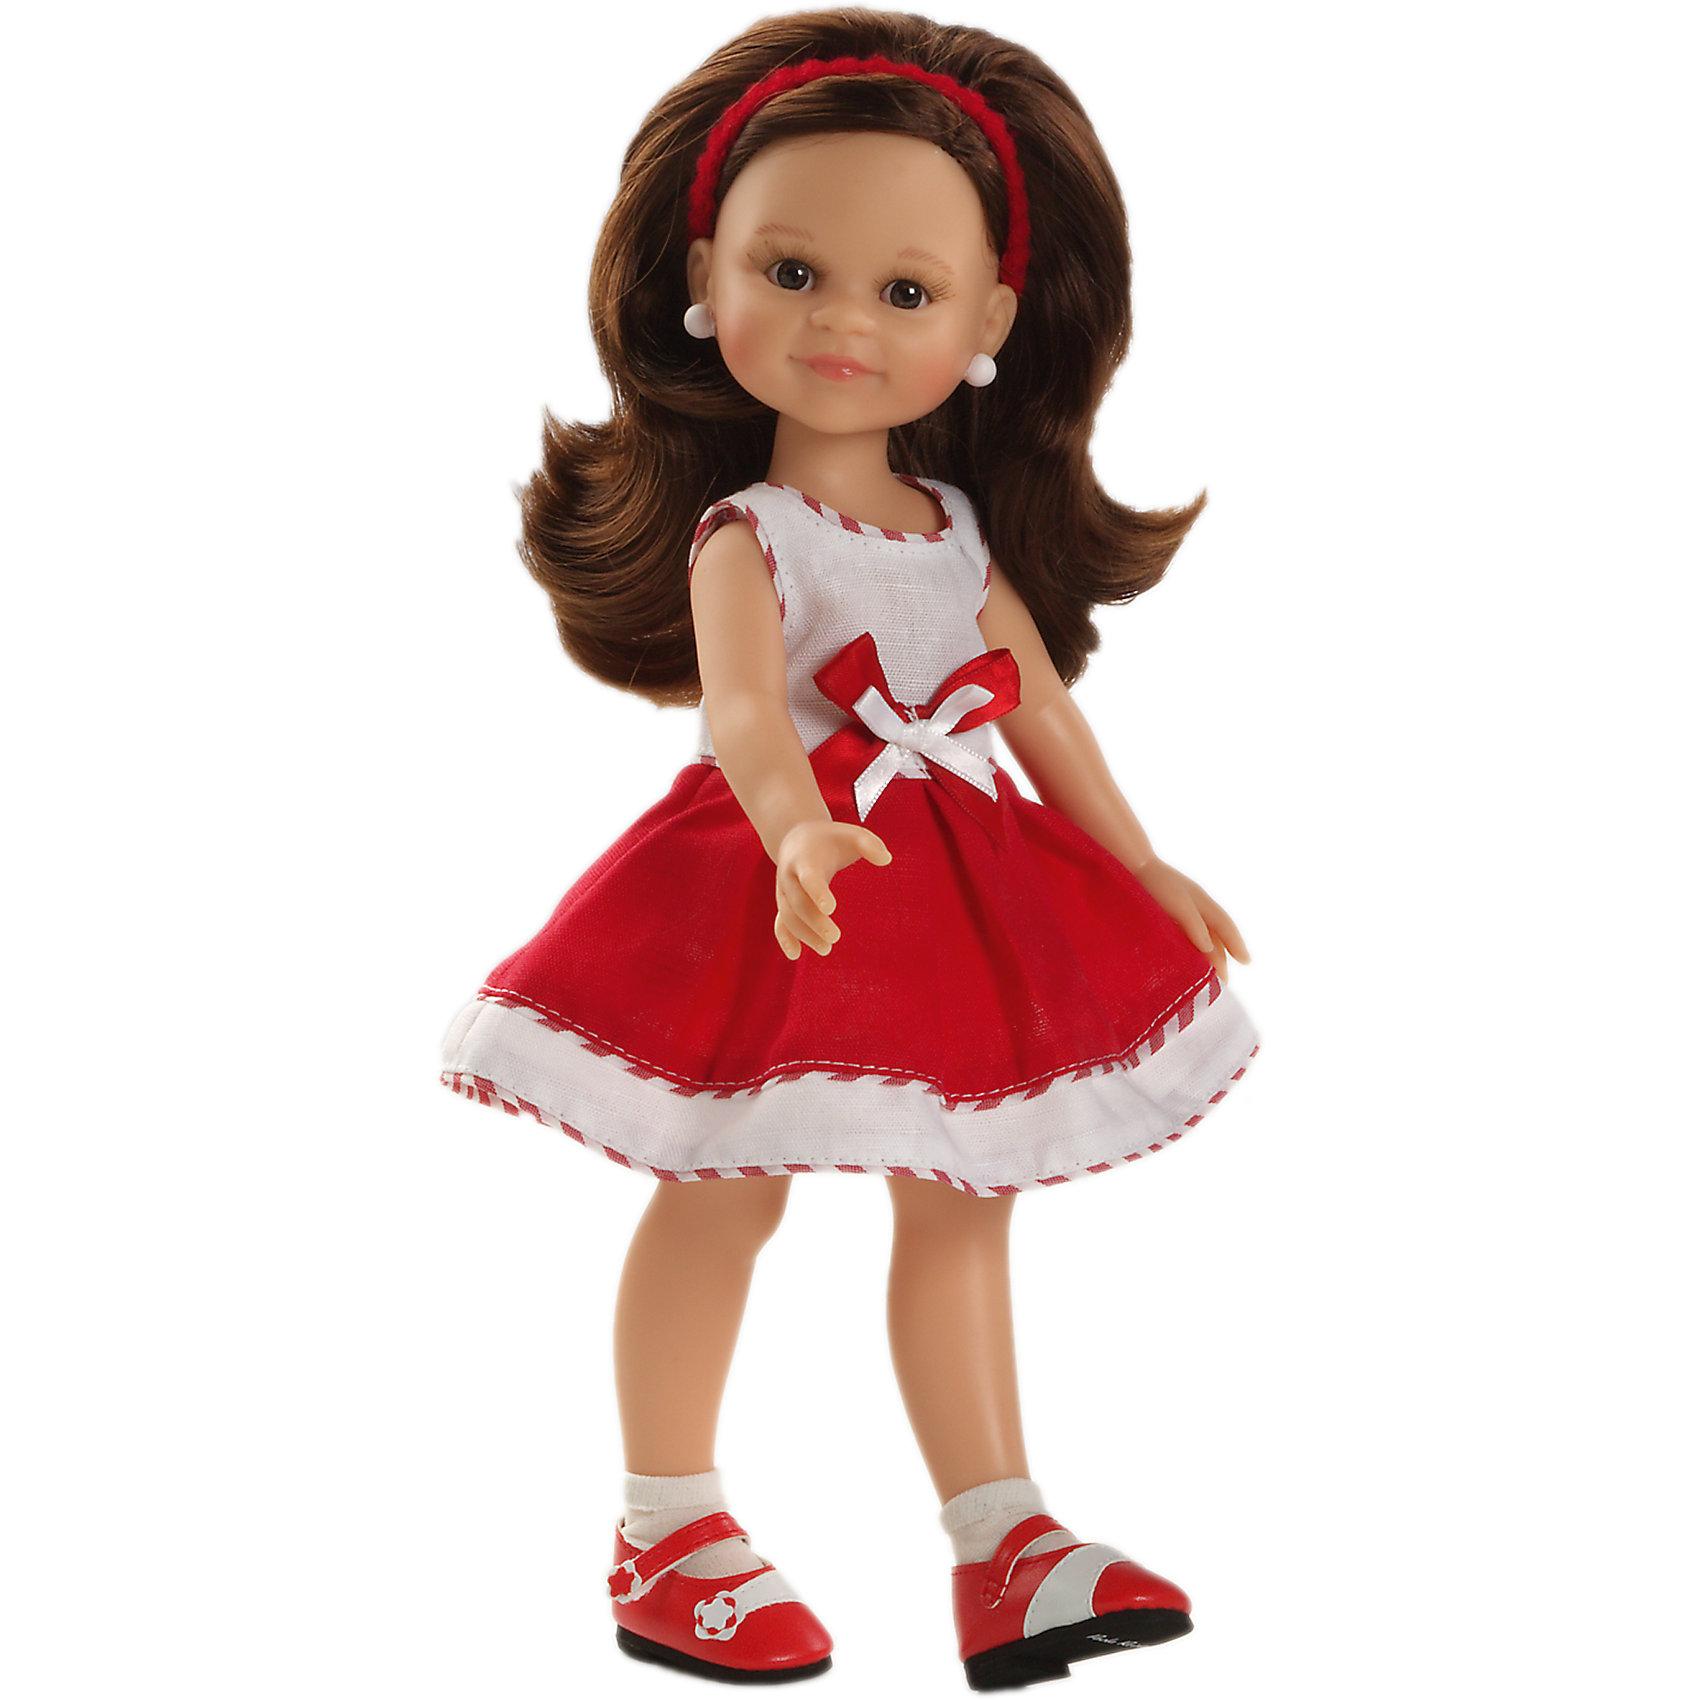 Paola Reina Кукла Клео, 32 см, Paola Reina paola reina пупс без одежды 22 см 31019